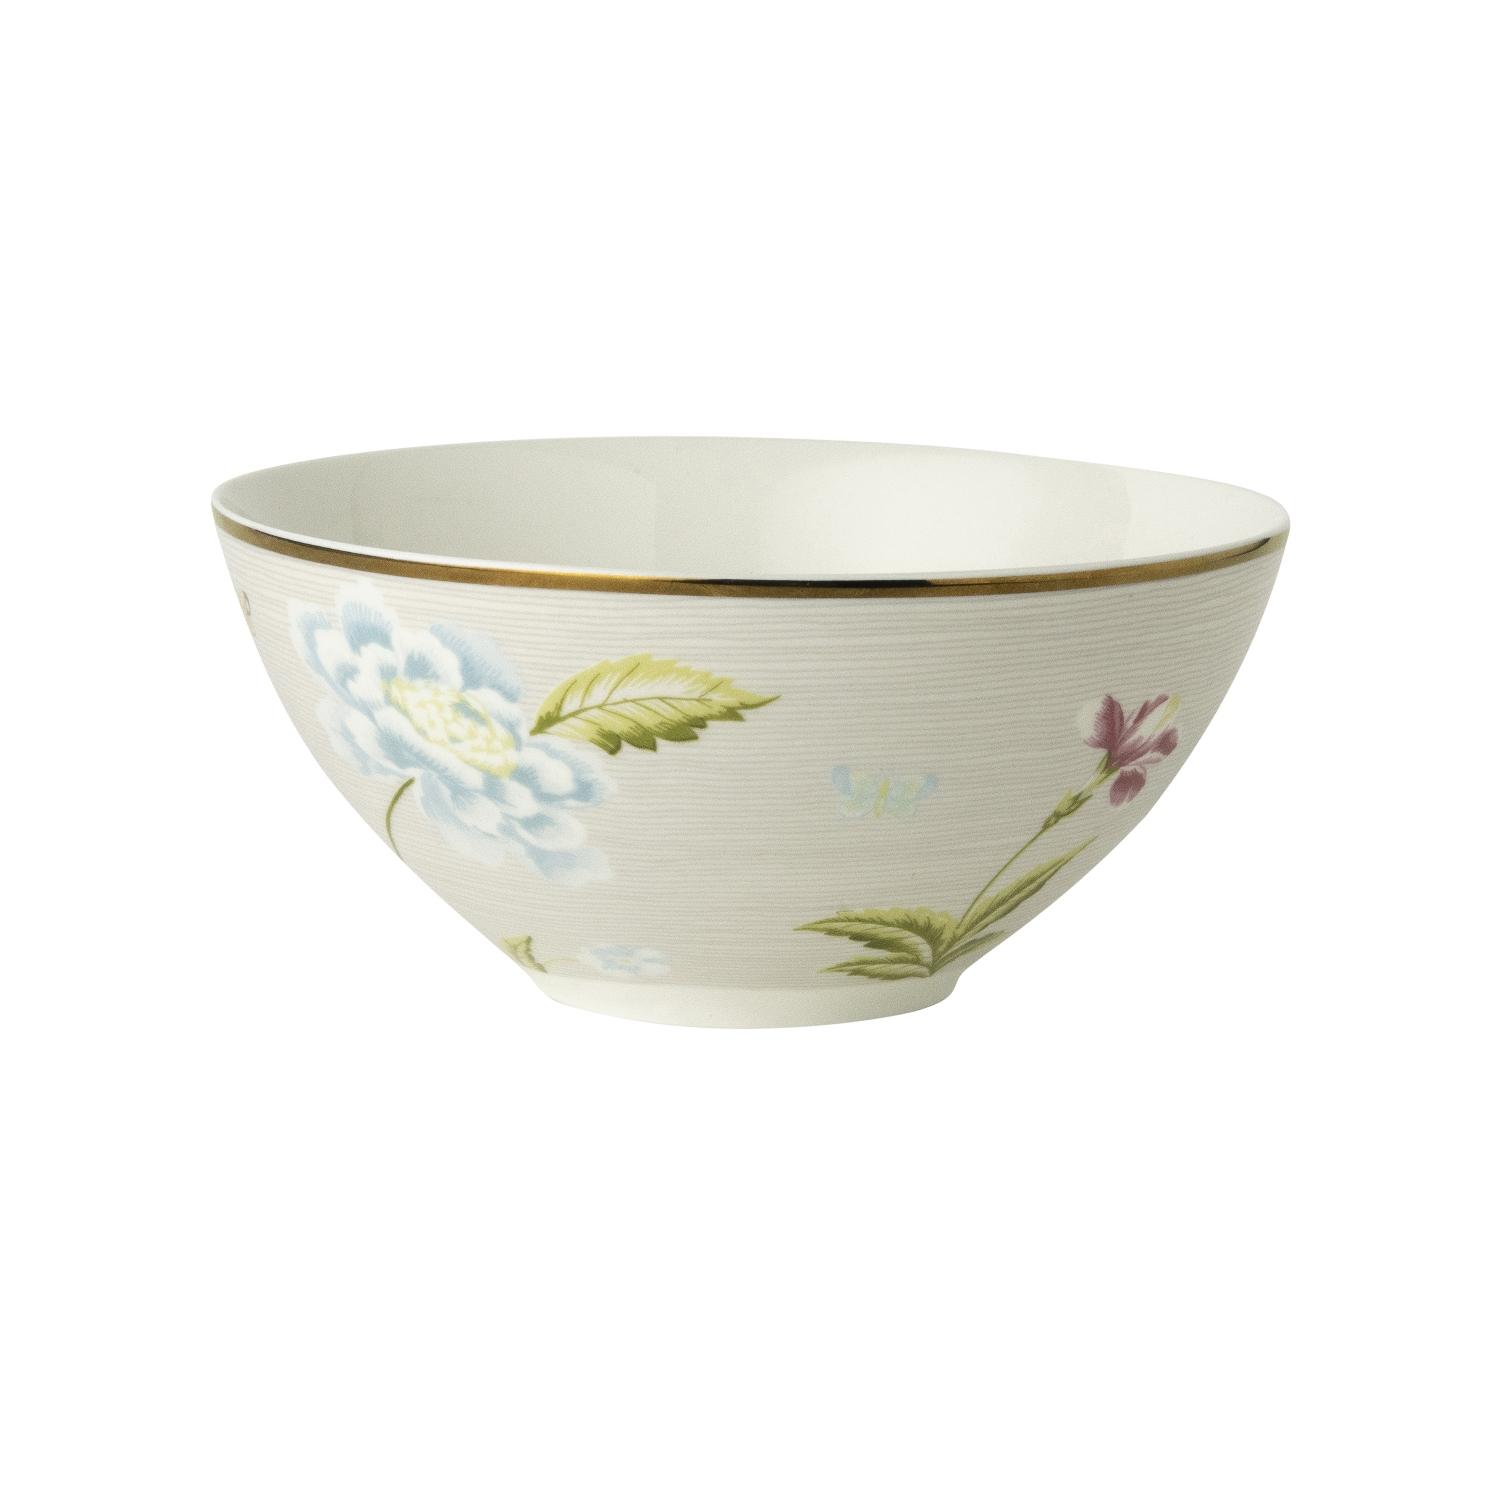 "Онлайн каталог PROMENU: Пиала ""Цветы"" Laura Ashley HERITAGE, диаметр 16 см, серый с цветами                               180516"